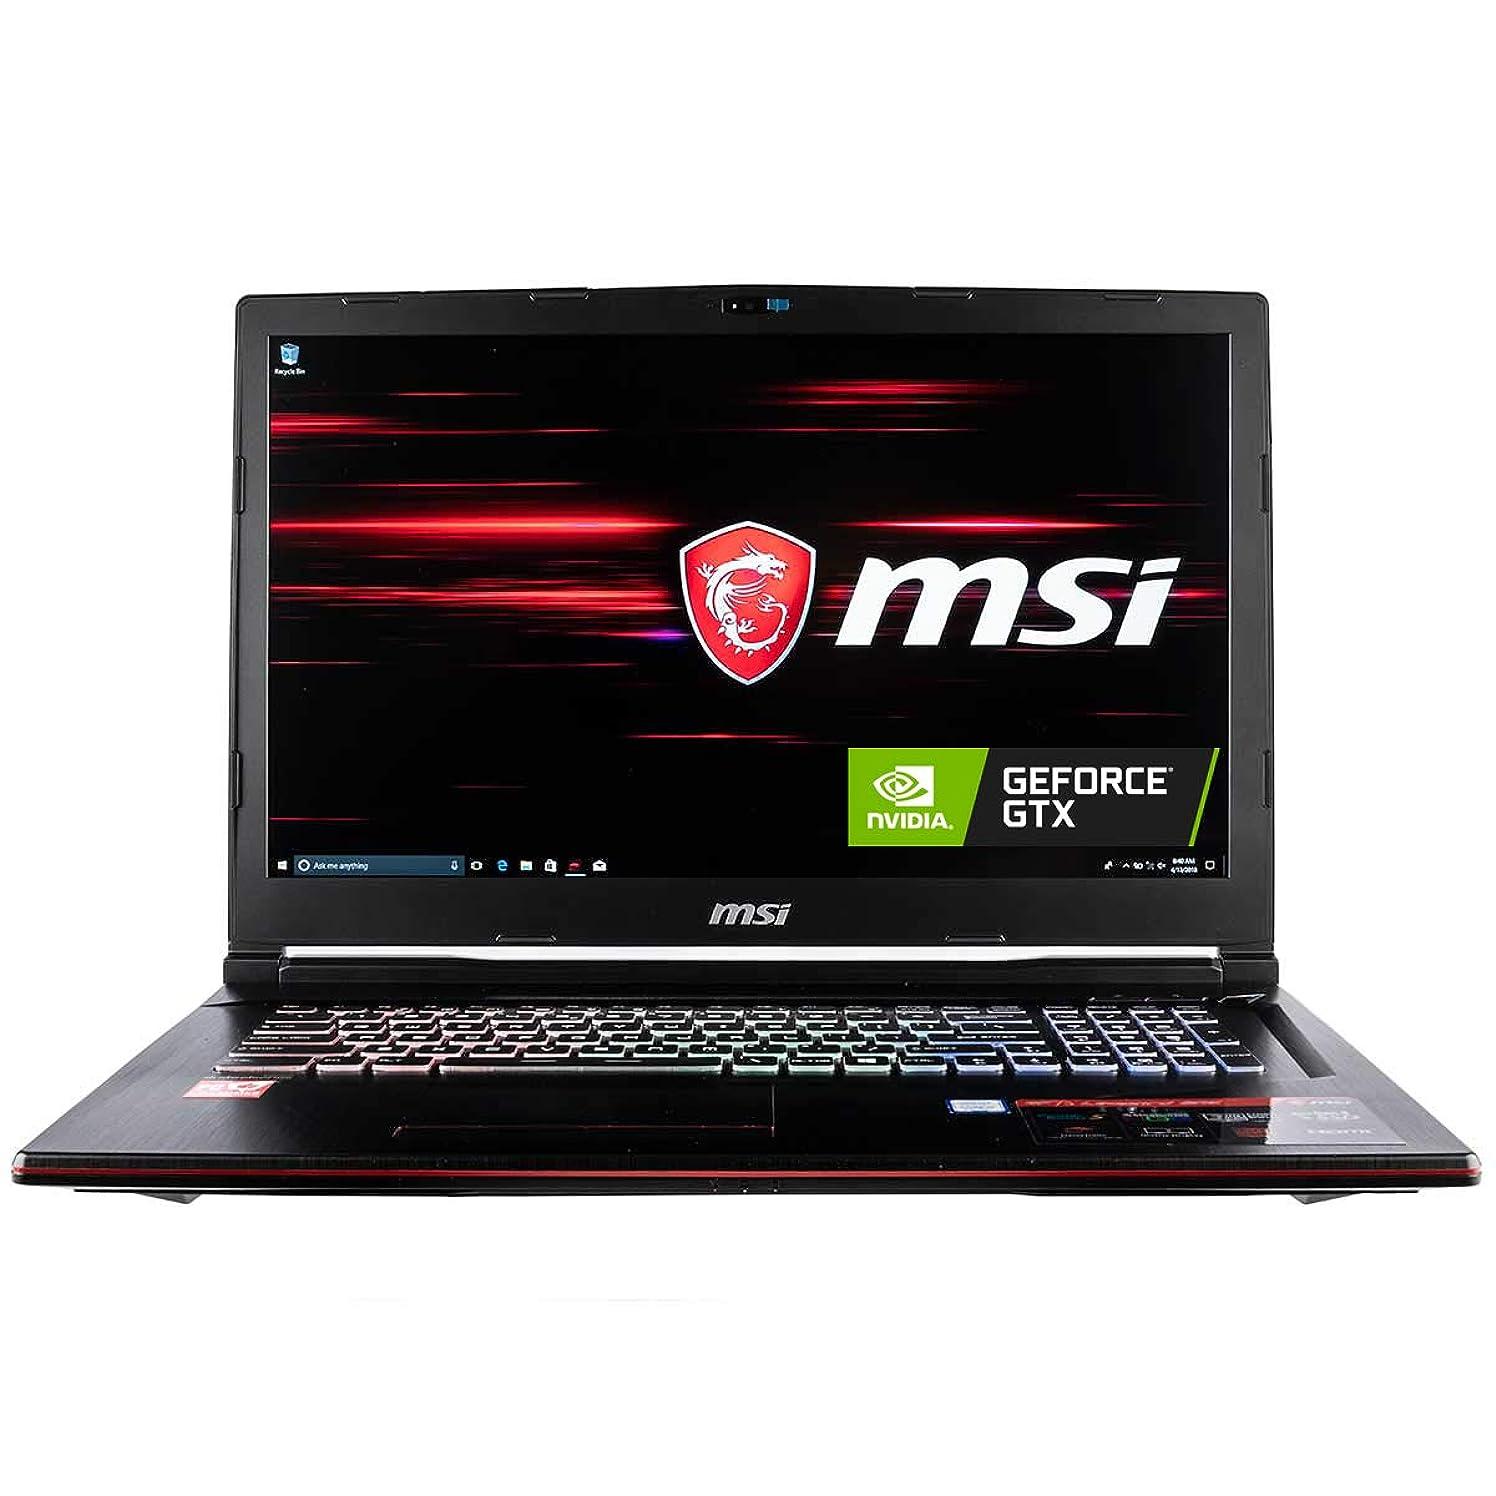 CUK MSI GP73 Leopard Gaming Laptop (8th Gen Intel Core i7-8750H, 32GB RAM, 1TB NVMe SSD + 2TB HDD, NVIDIA GeForce GTX 1060 6GB, 17.3